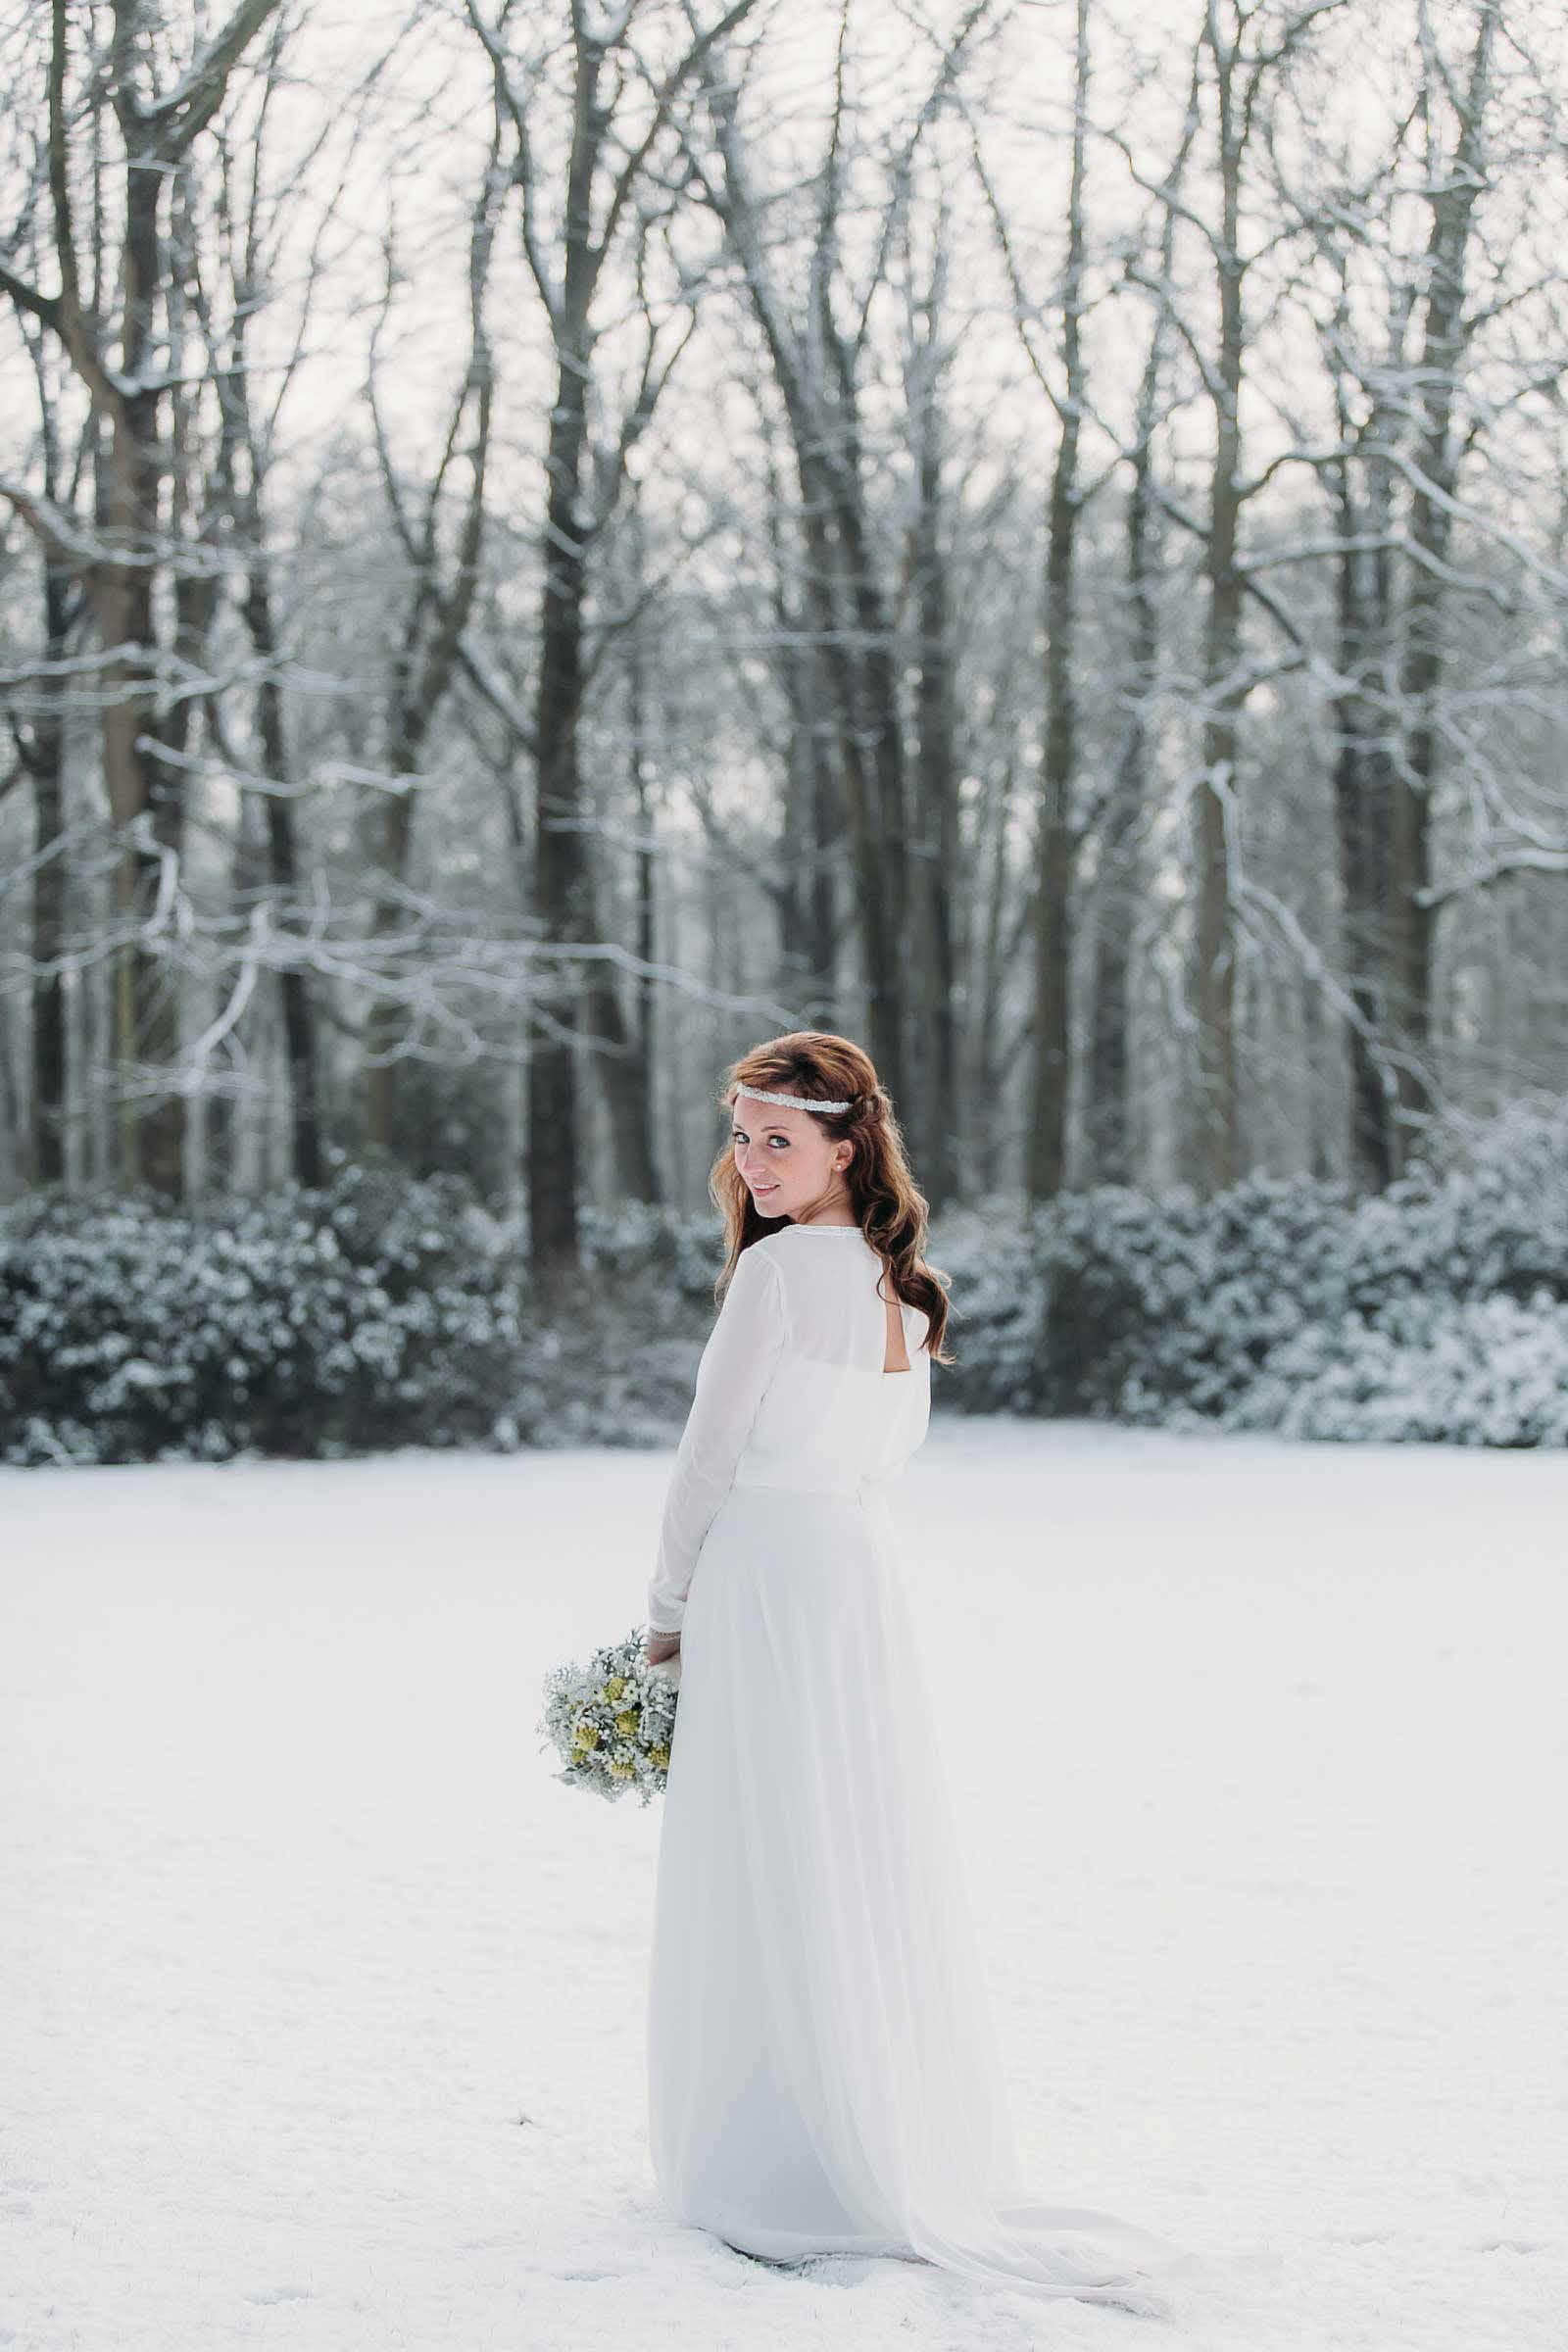 Evabloemweddings_bruidsfotografie_winterbruiloft_070.jpg